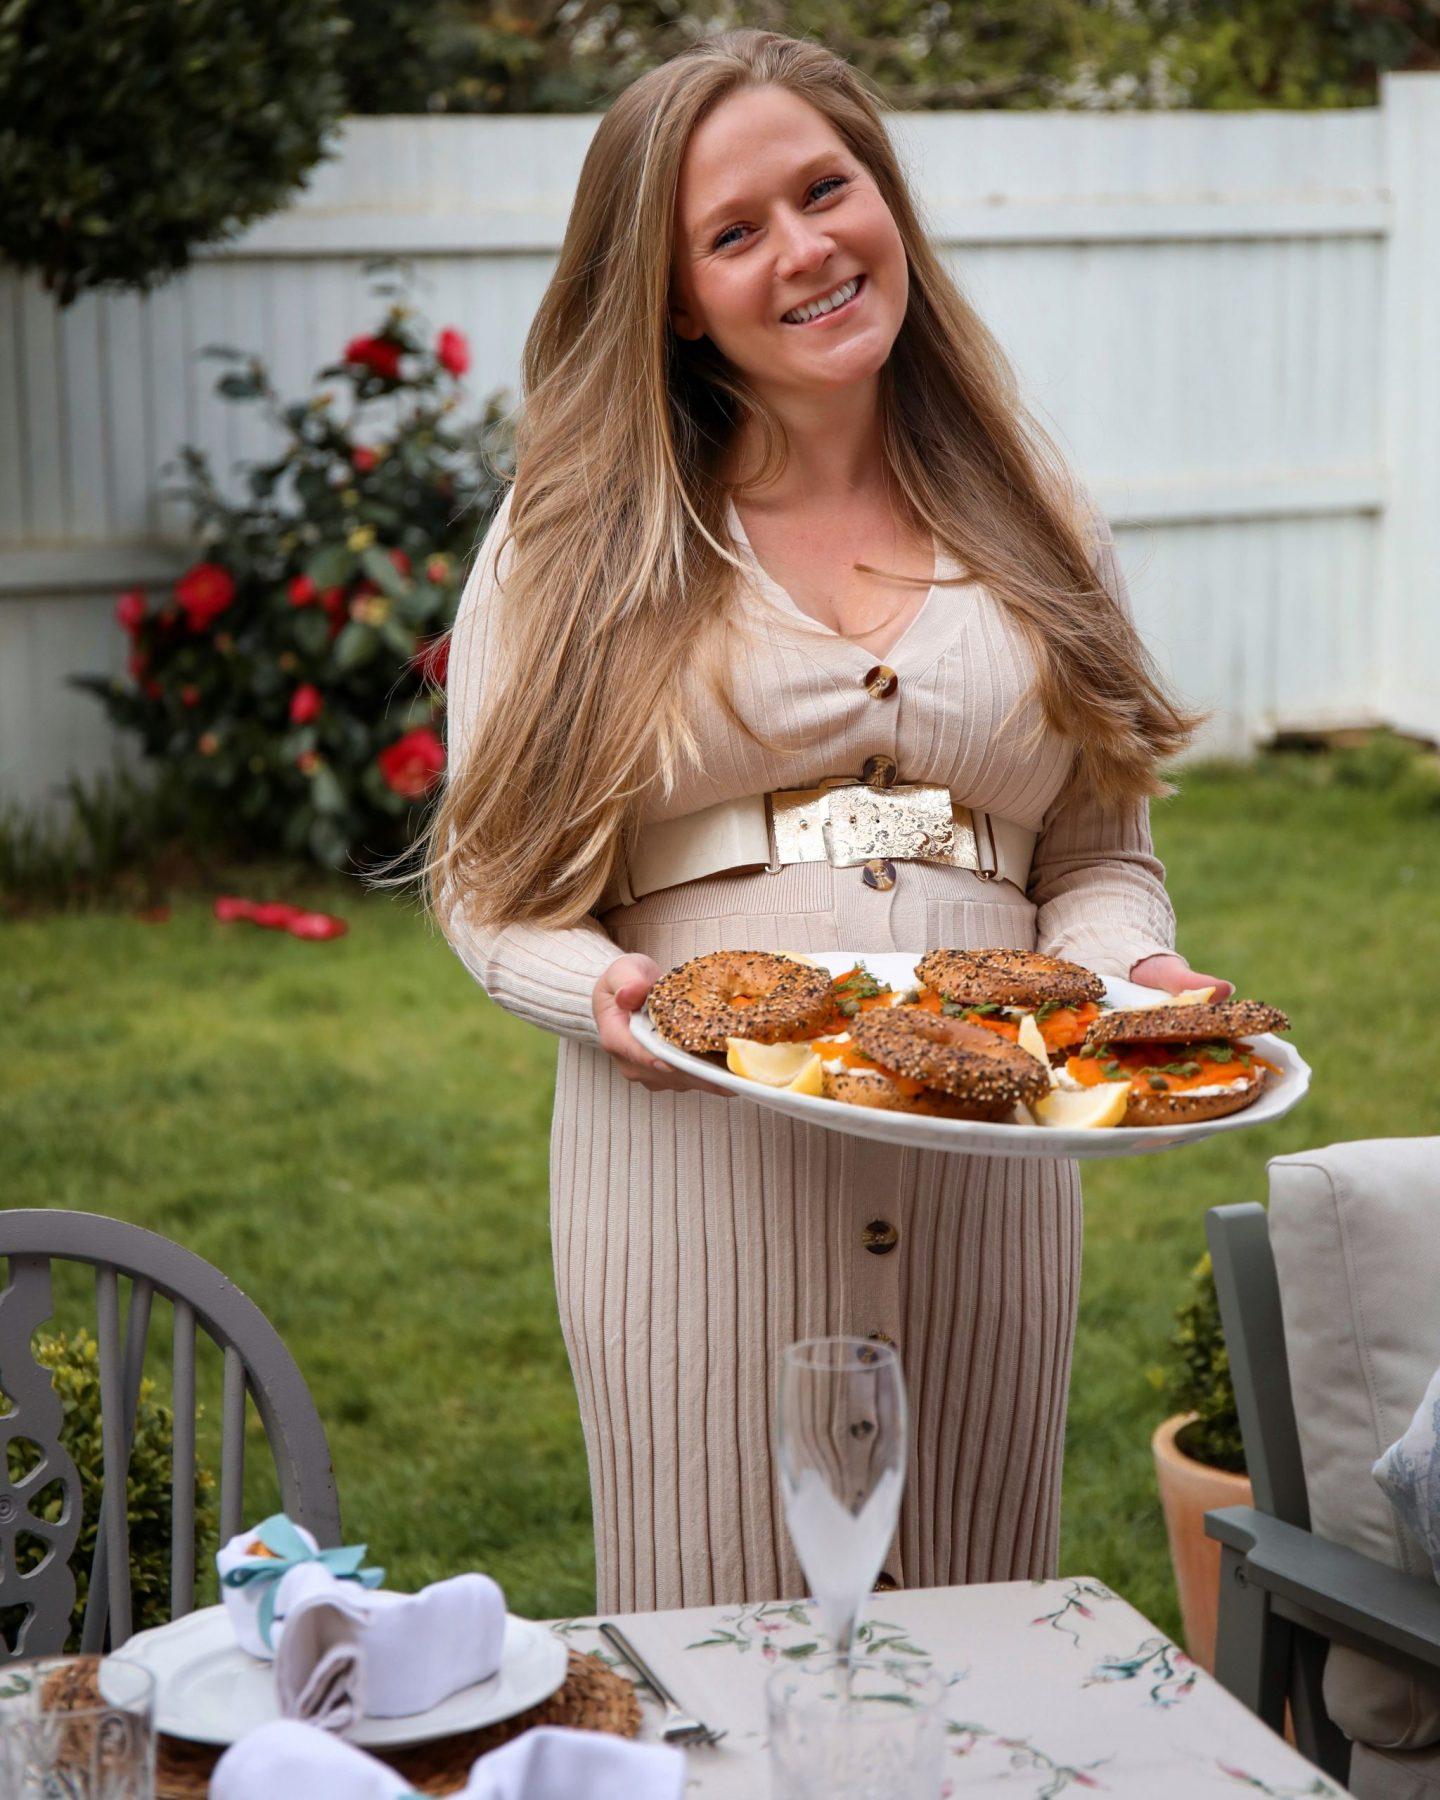 Pastel Easter Brunch Table 2021, Katie Heath KALANCHOE